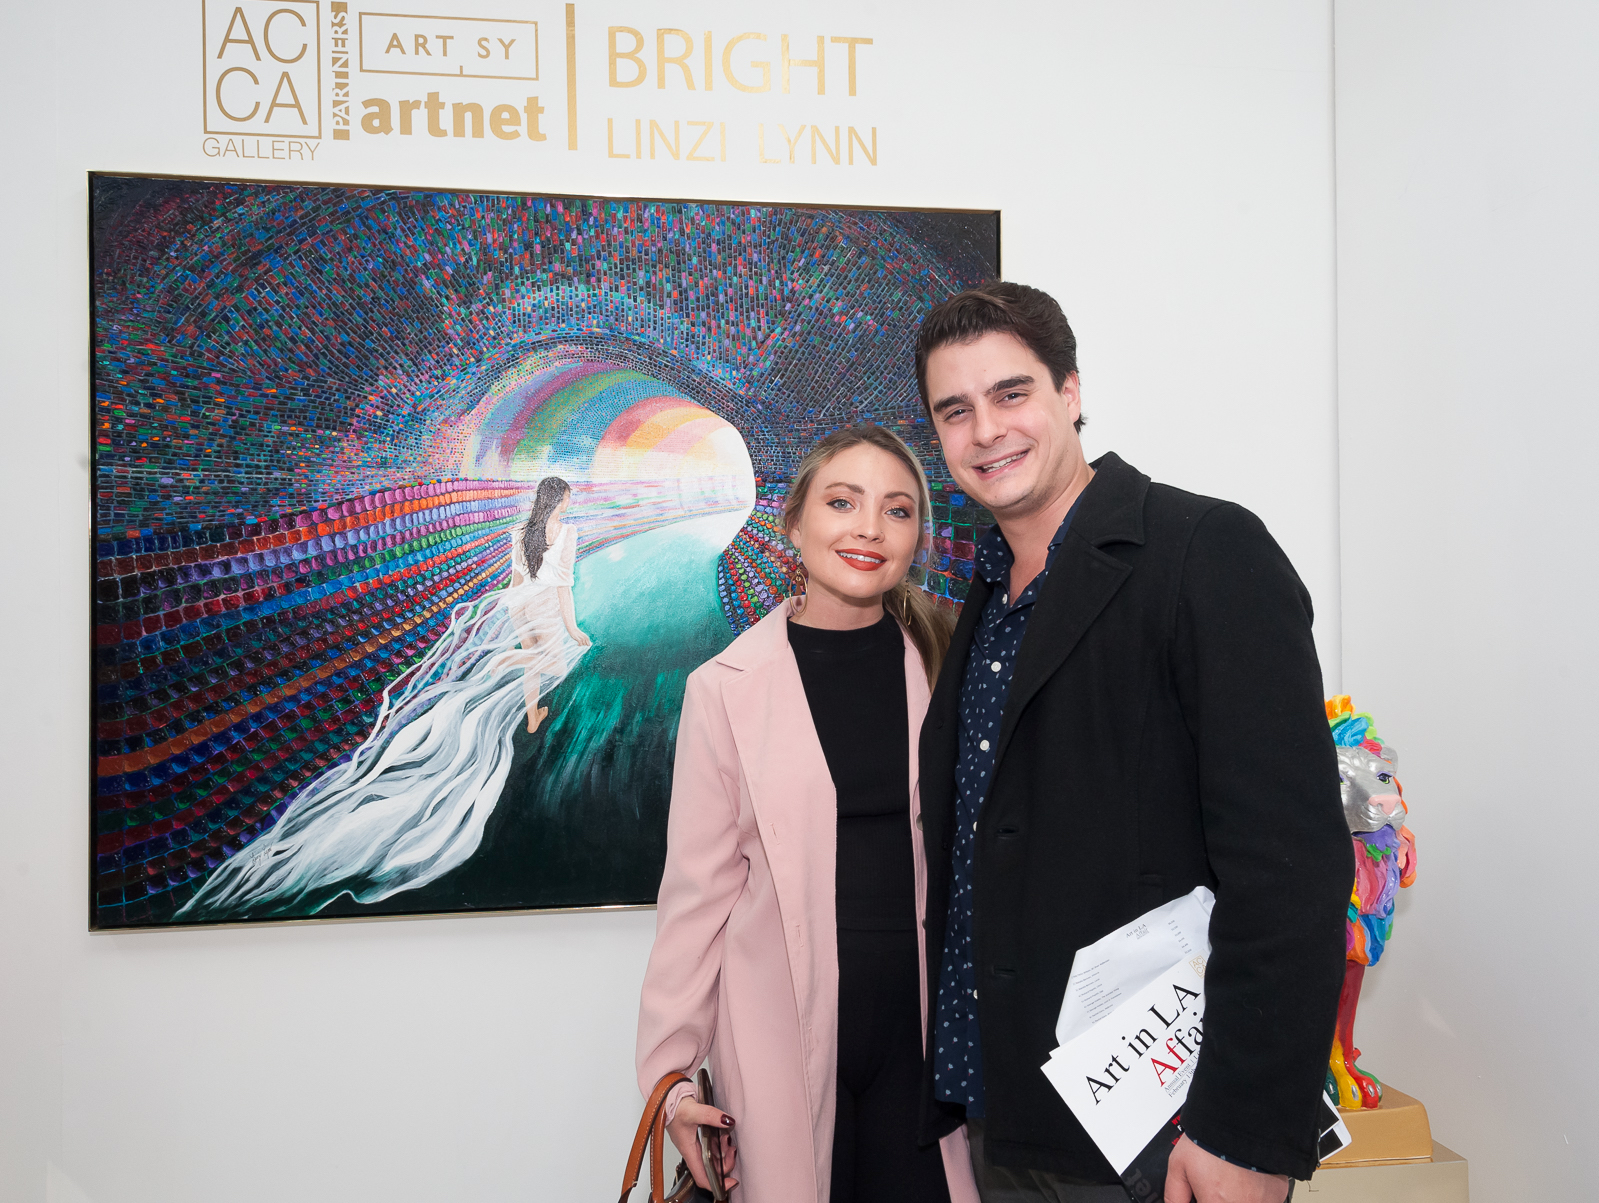 Artist Corner Gallery Feb 13 2019-0426.jpg